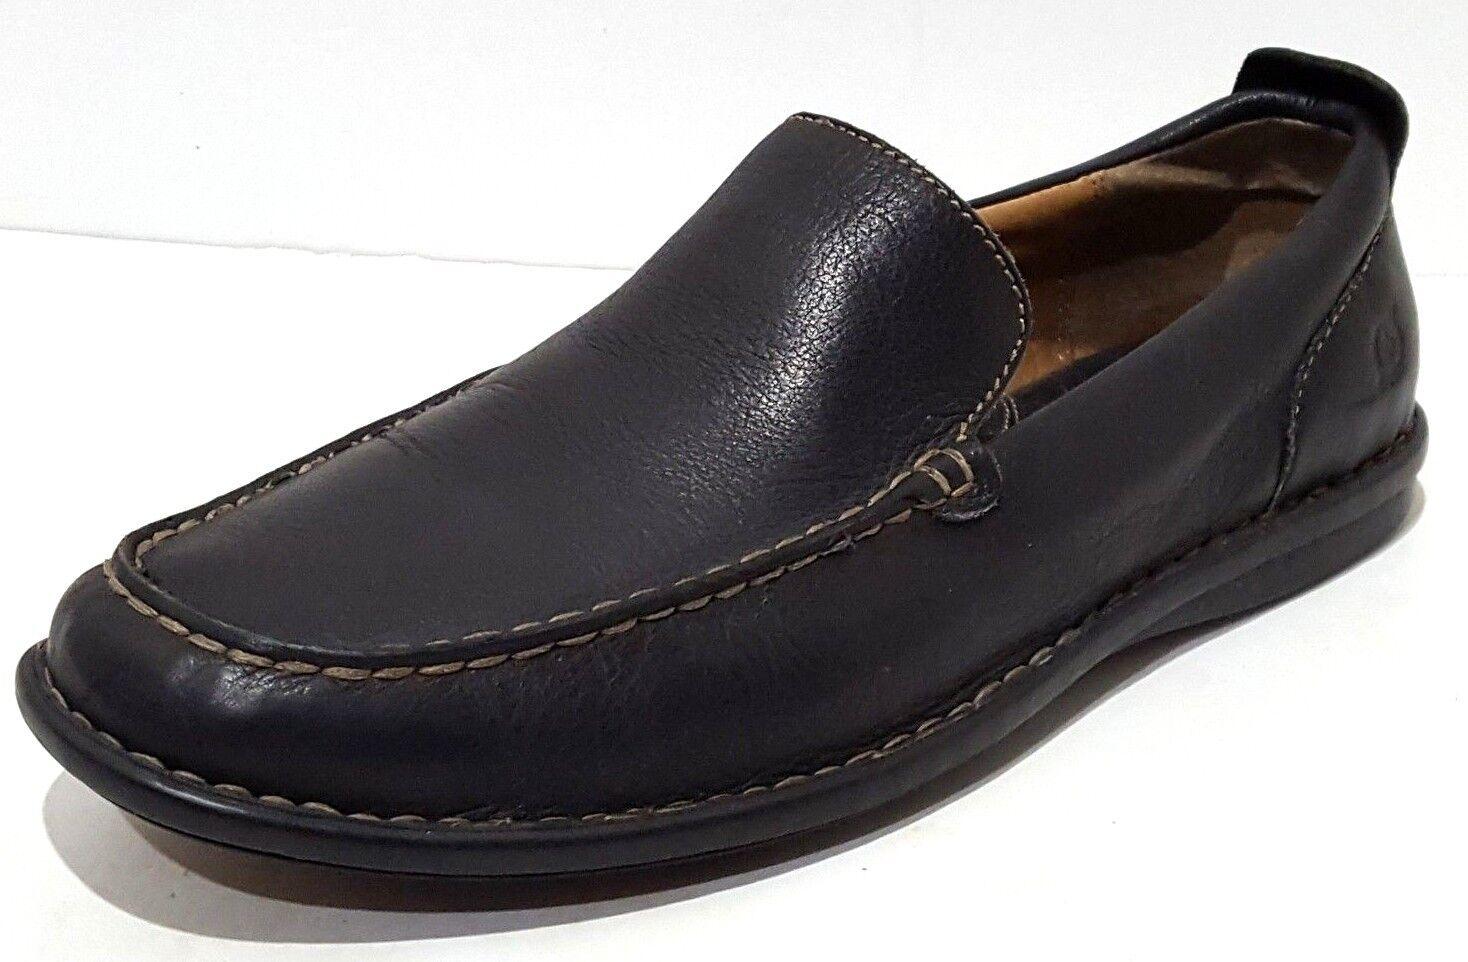 BORN Black Leather Slip On Loafer Driving Moc shoes Mens 8.5